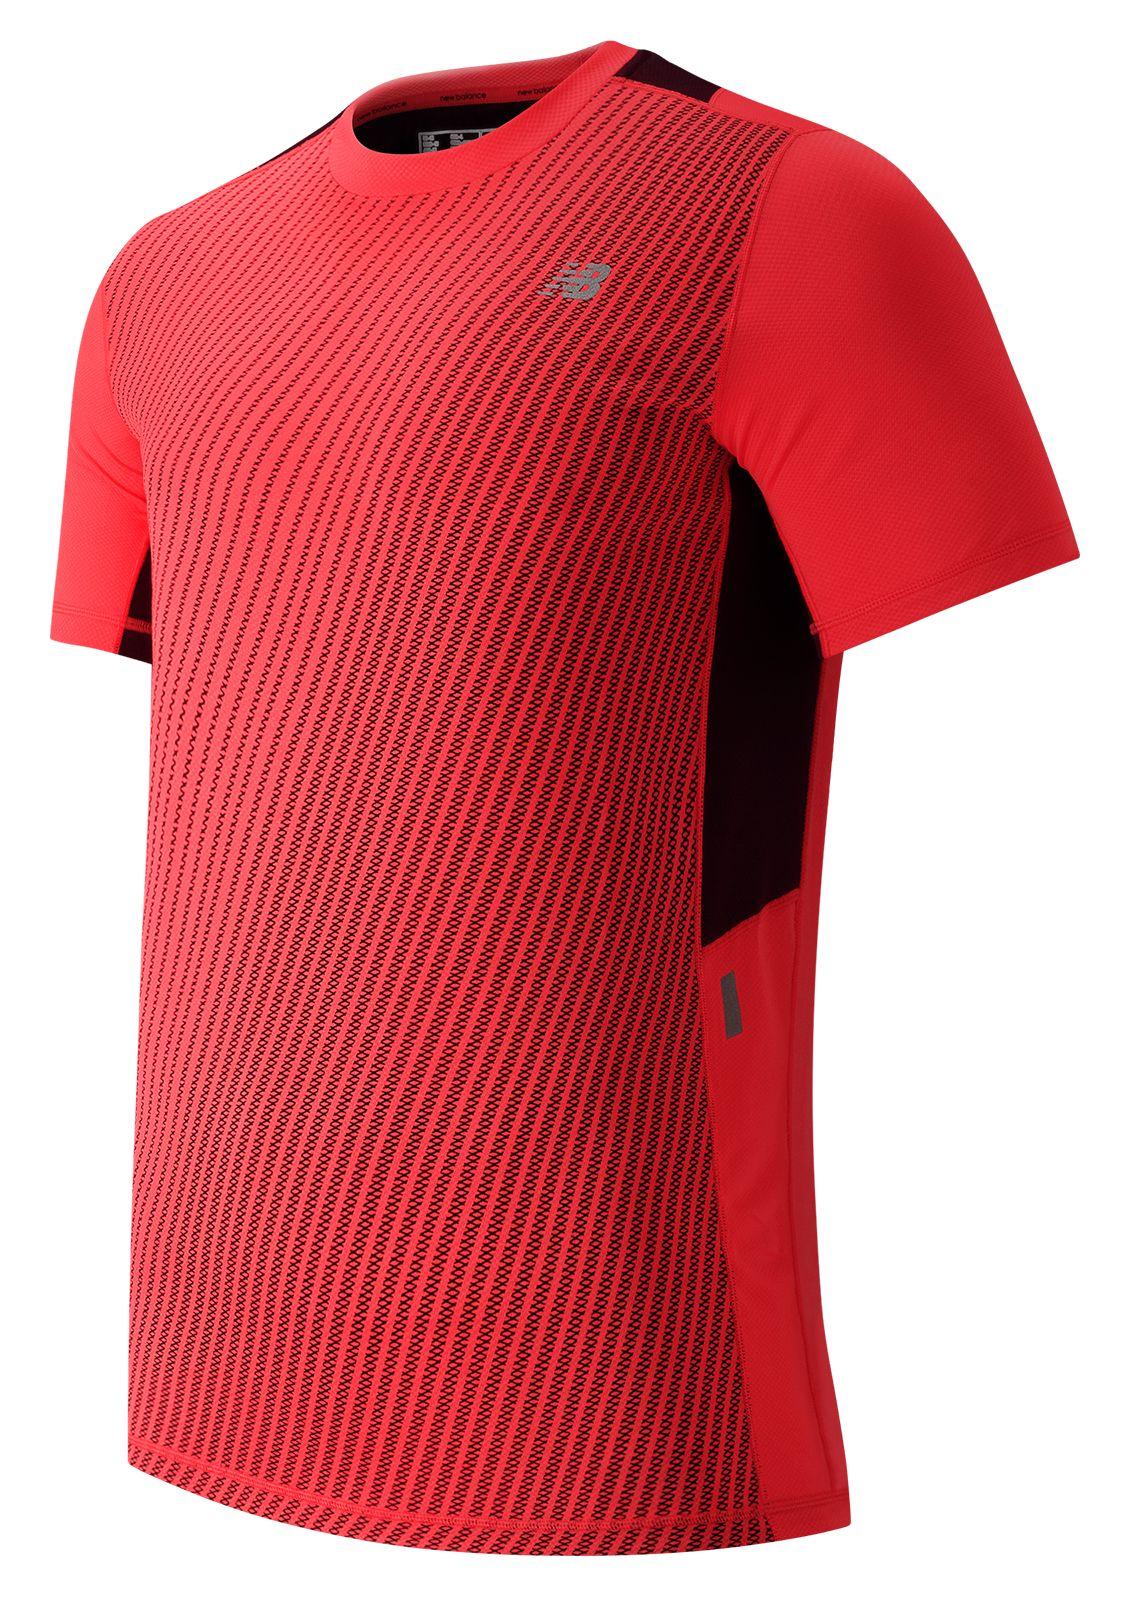 New Balance : NB Ice Short Sleeve : Men's Short Sleeve & Sleeveless Shirts : MT53224FLM